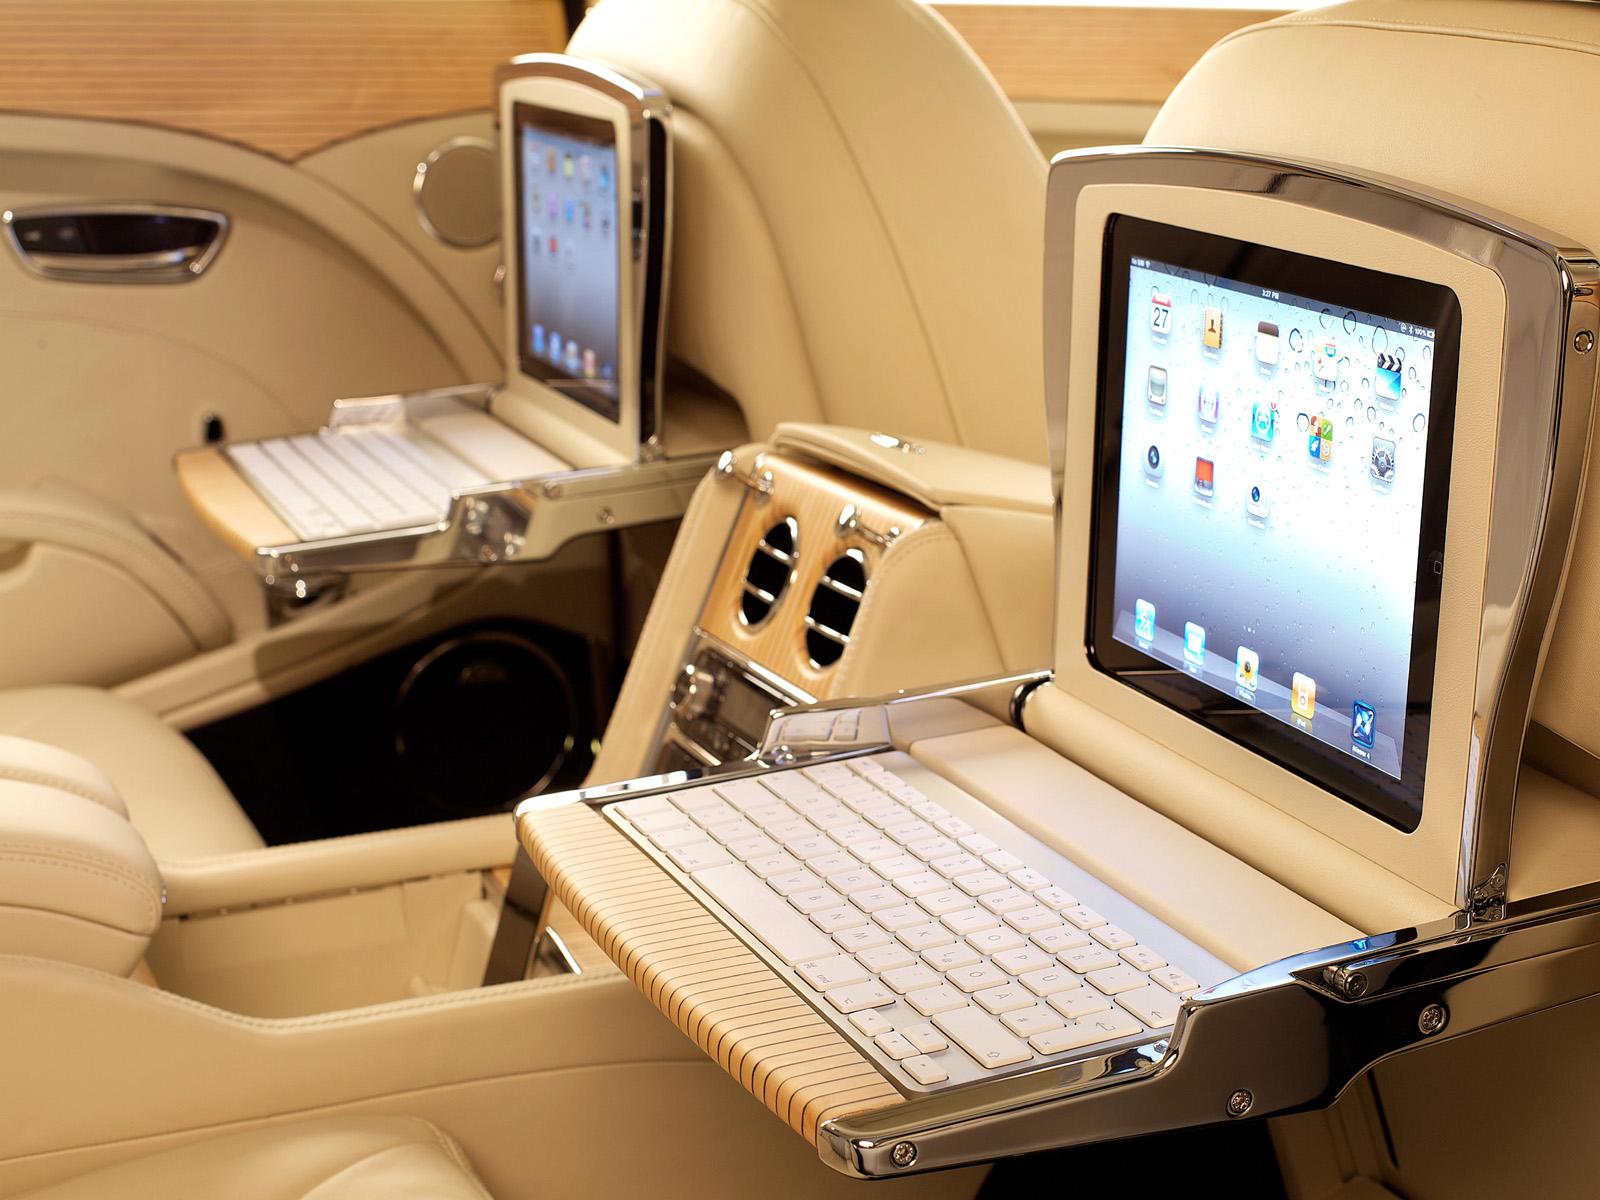 http://4.bp.blogspot.com/-dNJvE6FBVbo/UDTwYJK-_EI/AAAAAAAACFc/_ebcKHN_ANU/s1600/Bentleymulsanne+luxuary+car+Interior+biege+leather+rear+seat+infotainment+ipod+LCD+4.jpg